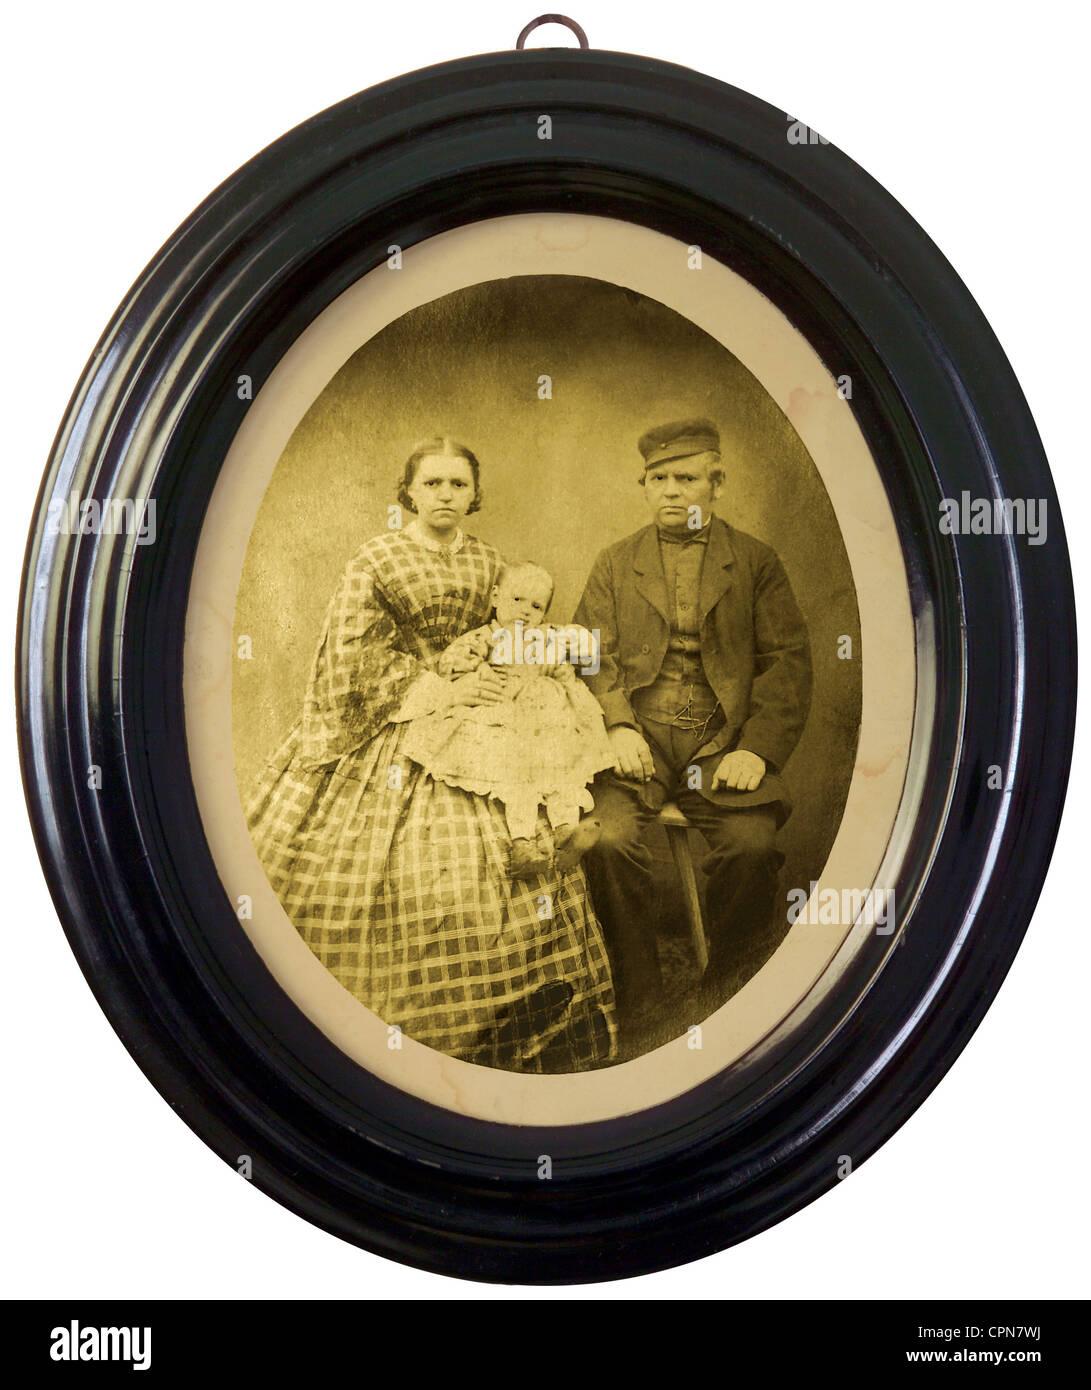 Oval Frame Antique Stockfotos & Oval Frame Antique Bilder - Alamy